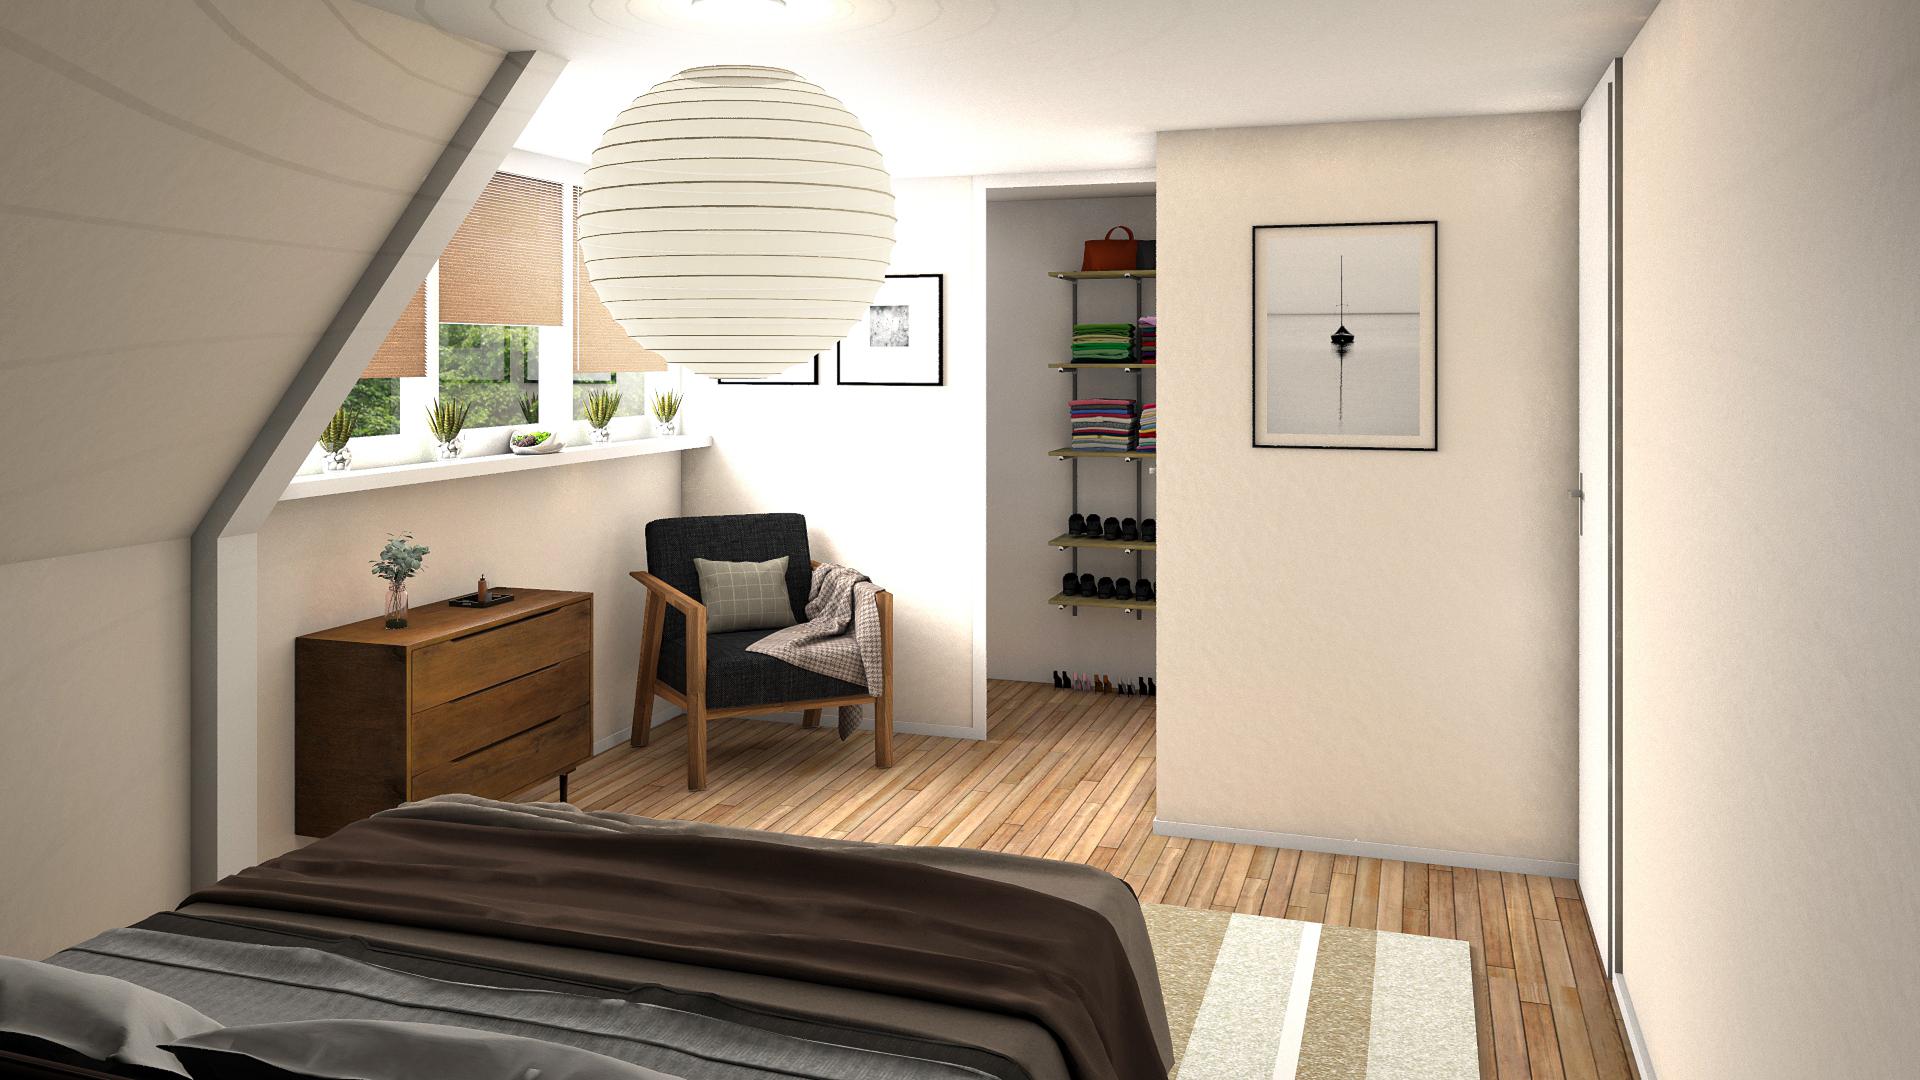 Slaapkamer woning Lekkumerweg Leeuwarden